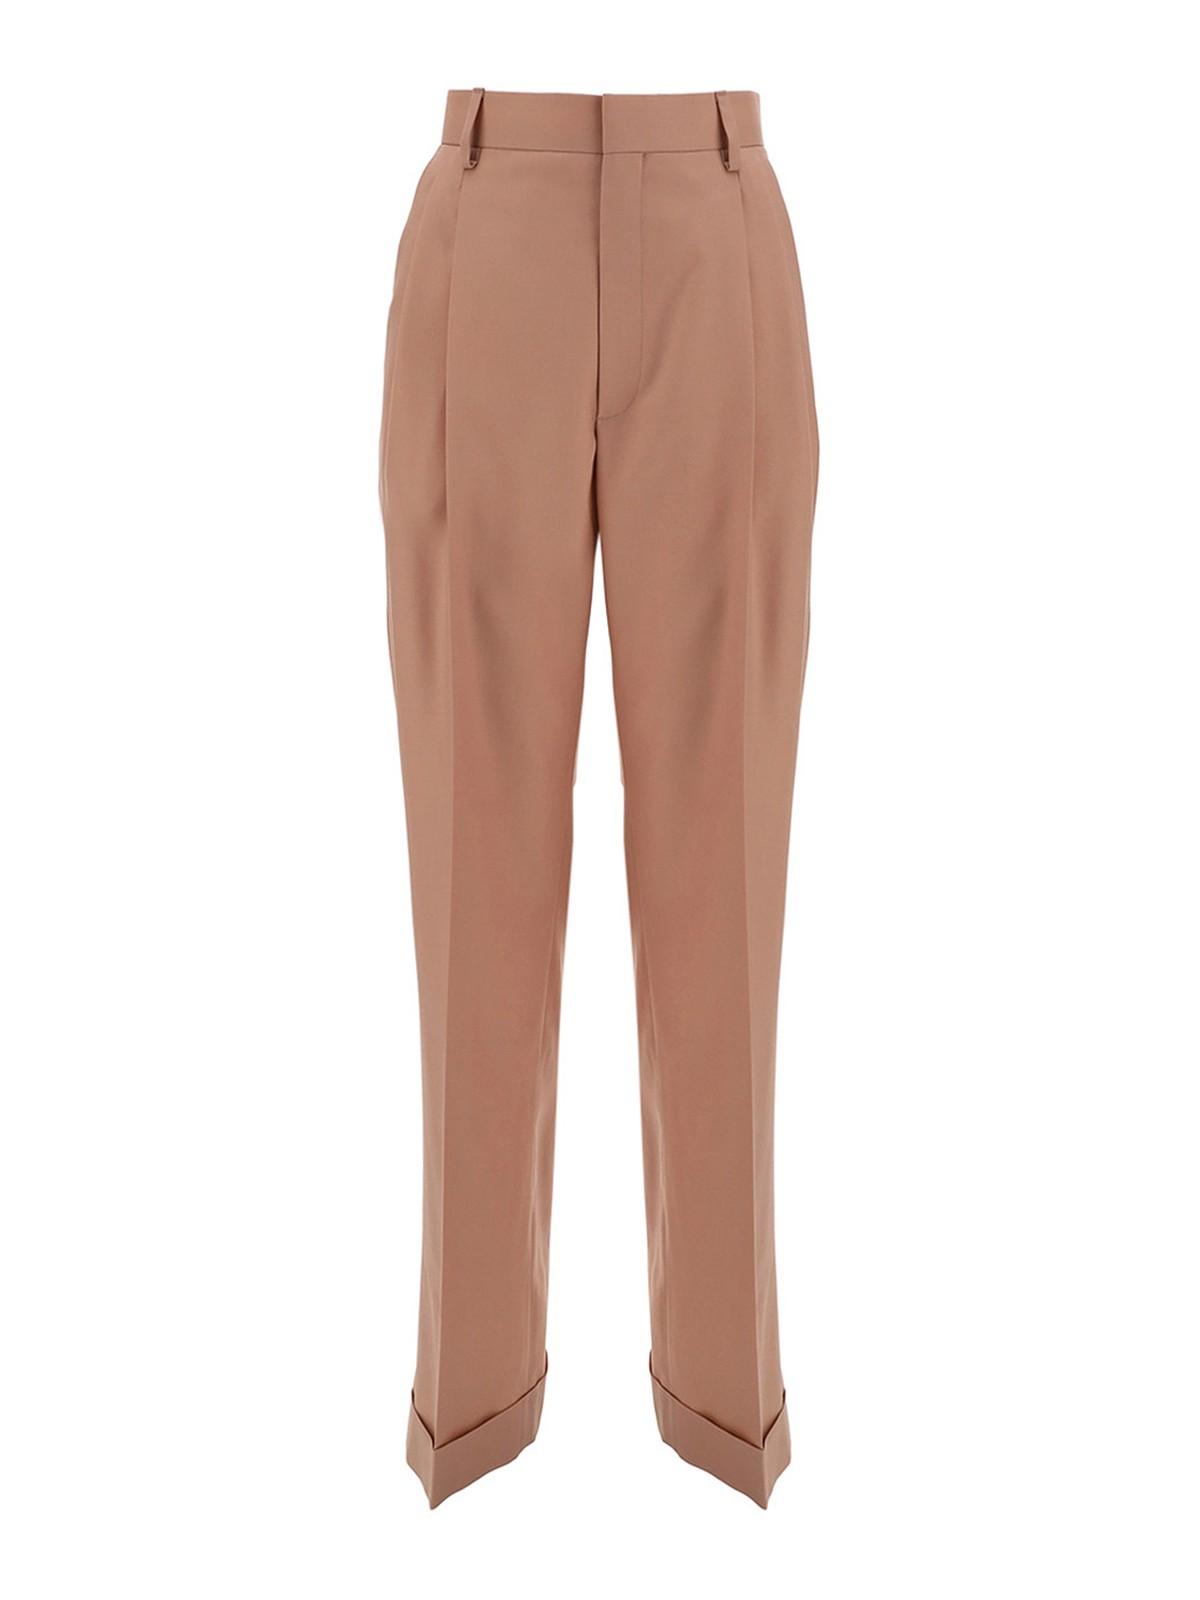 Casablanca Pants FLEECE WOOL PANTS